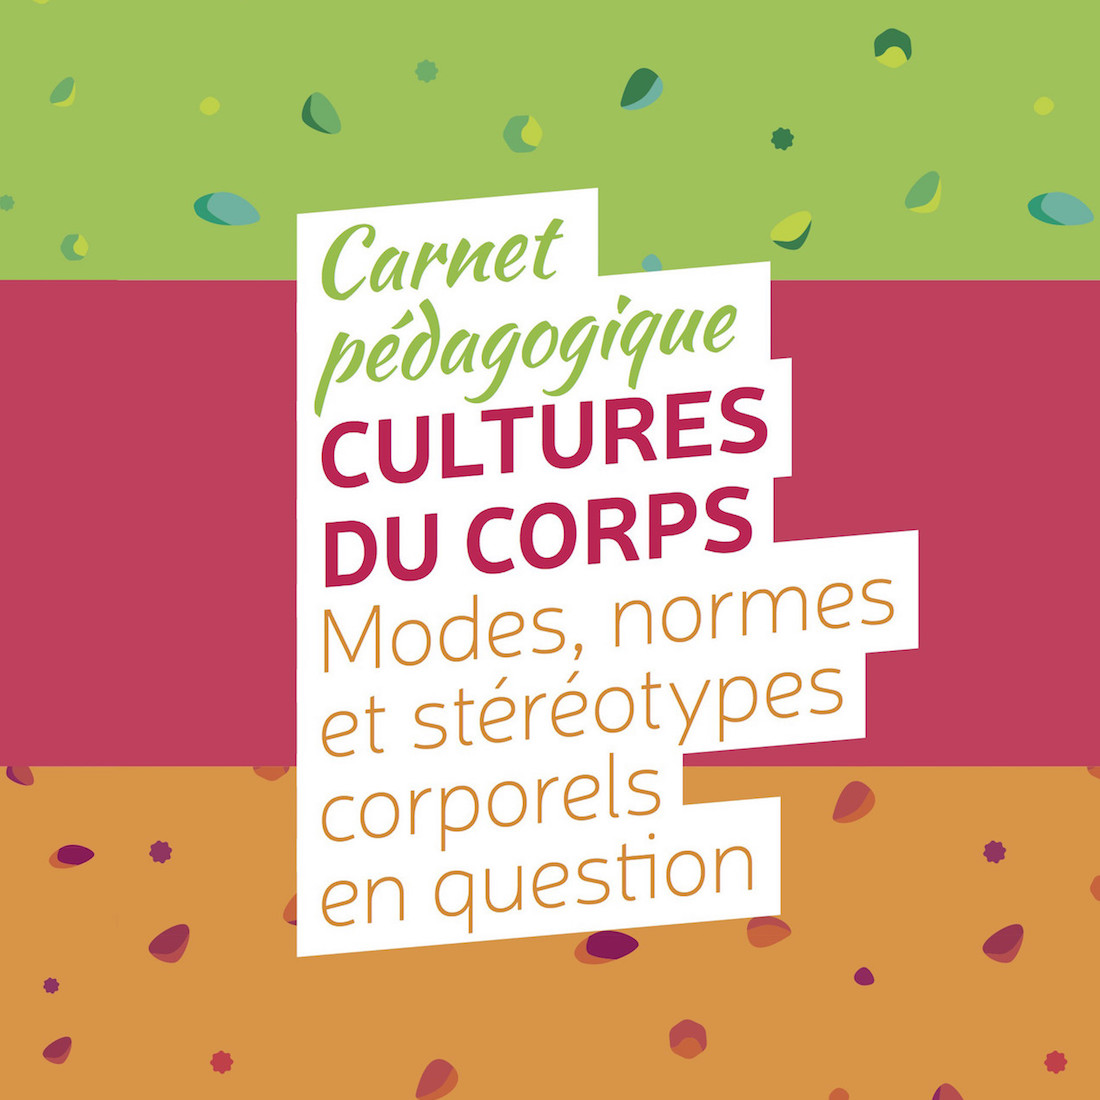 belgik-mojaik-outil-pedagogique-jeunes-cultures-du-corps-illu-1